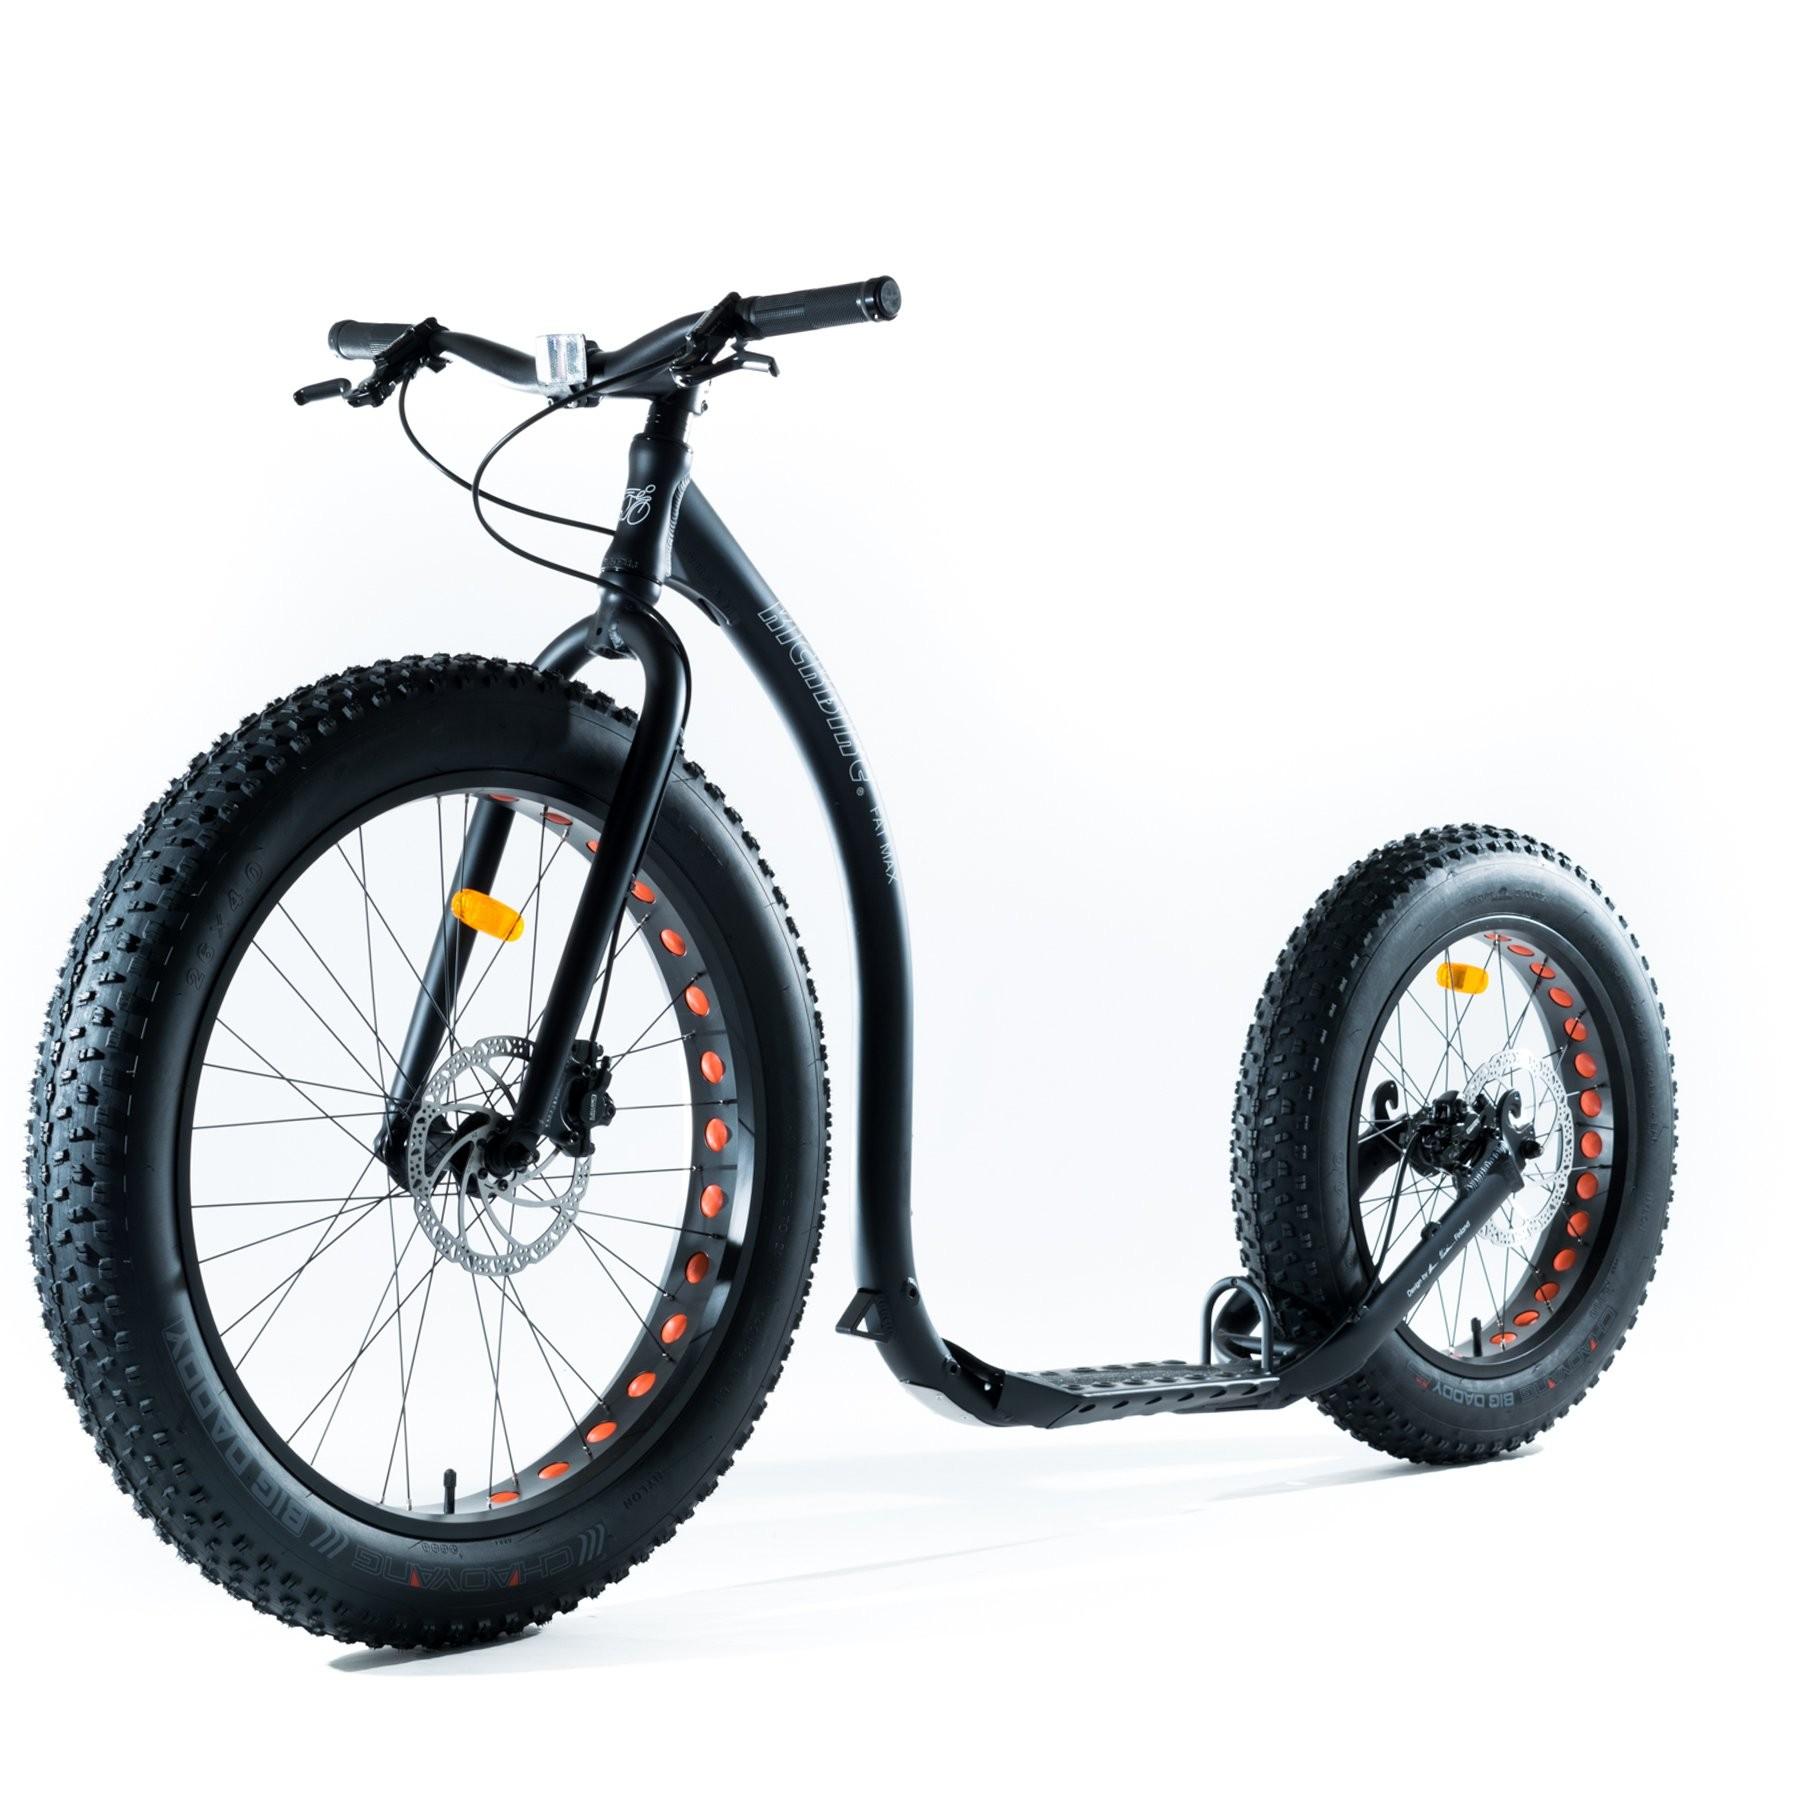 Tires For The Snow >> Kickbike Worldwide | Kickbike - FAT MAX